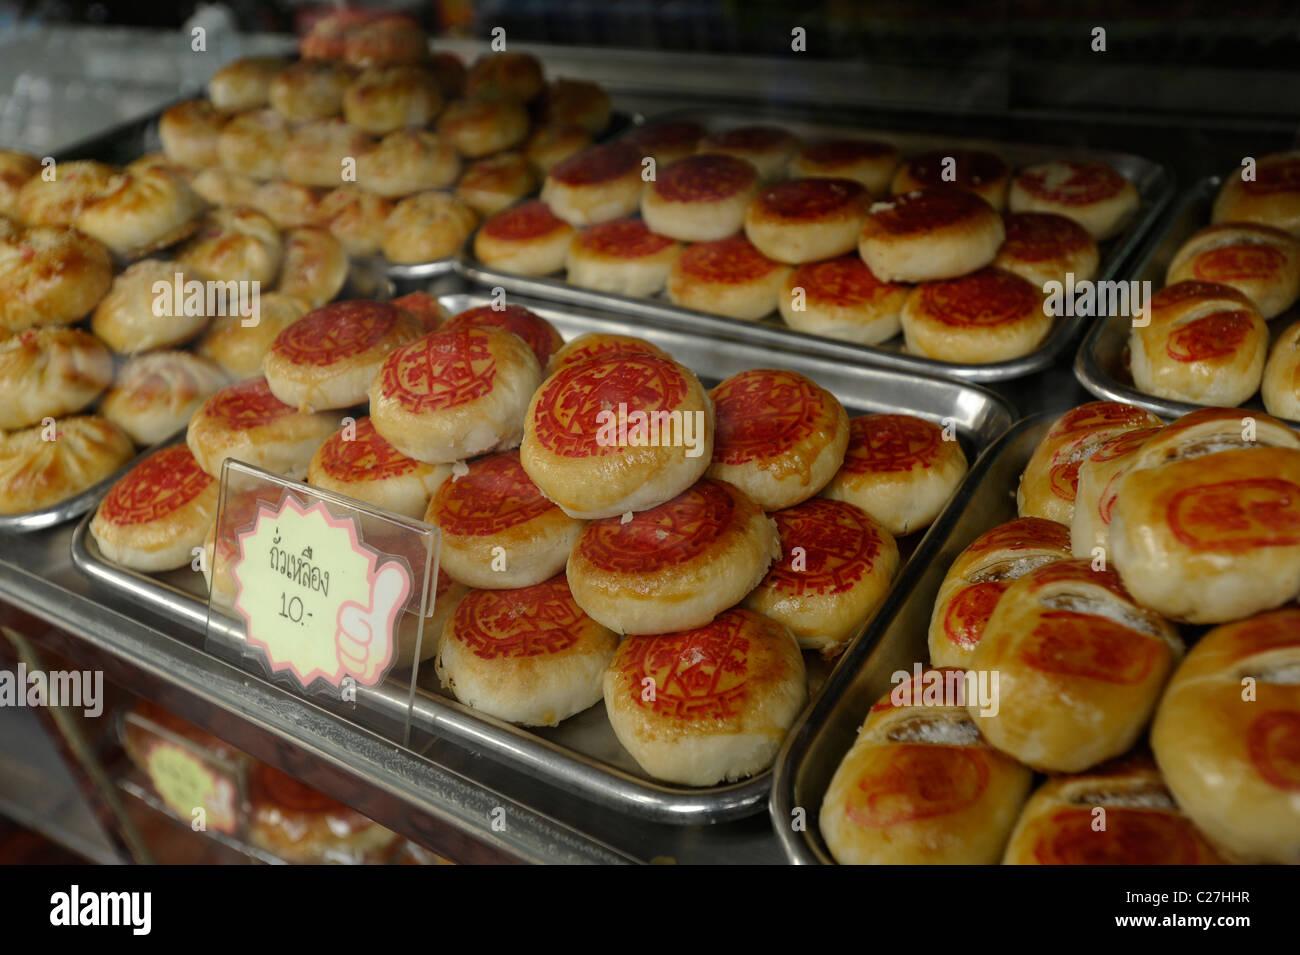 Chinese Cakes On Display Sweet And Savoury Snacks Thai Chinese Patisery Bangkok Thailand